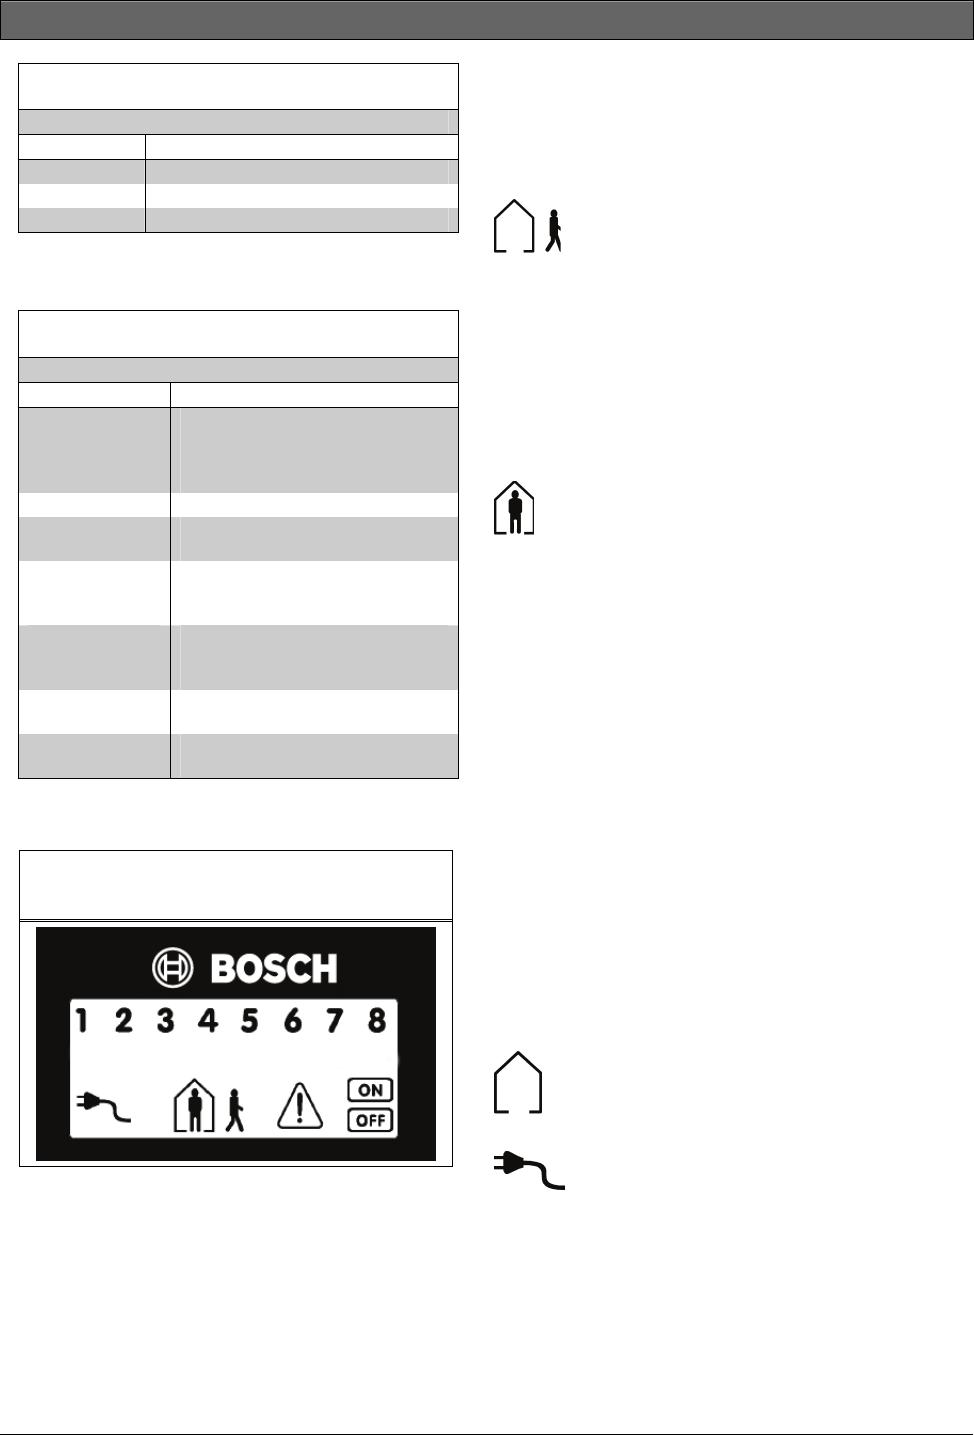 Bosch Appliances ICP-CC404 3 2 ICP-CP508LW Eight Zo ne LCD Codepad